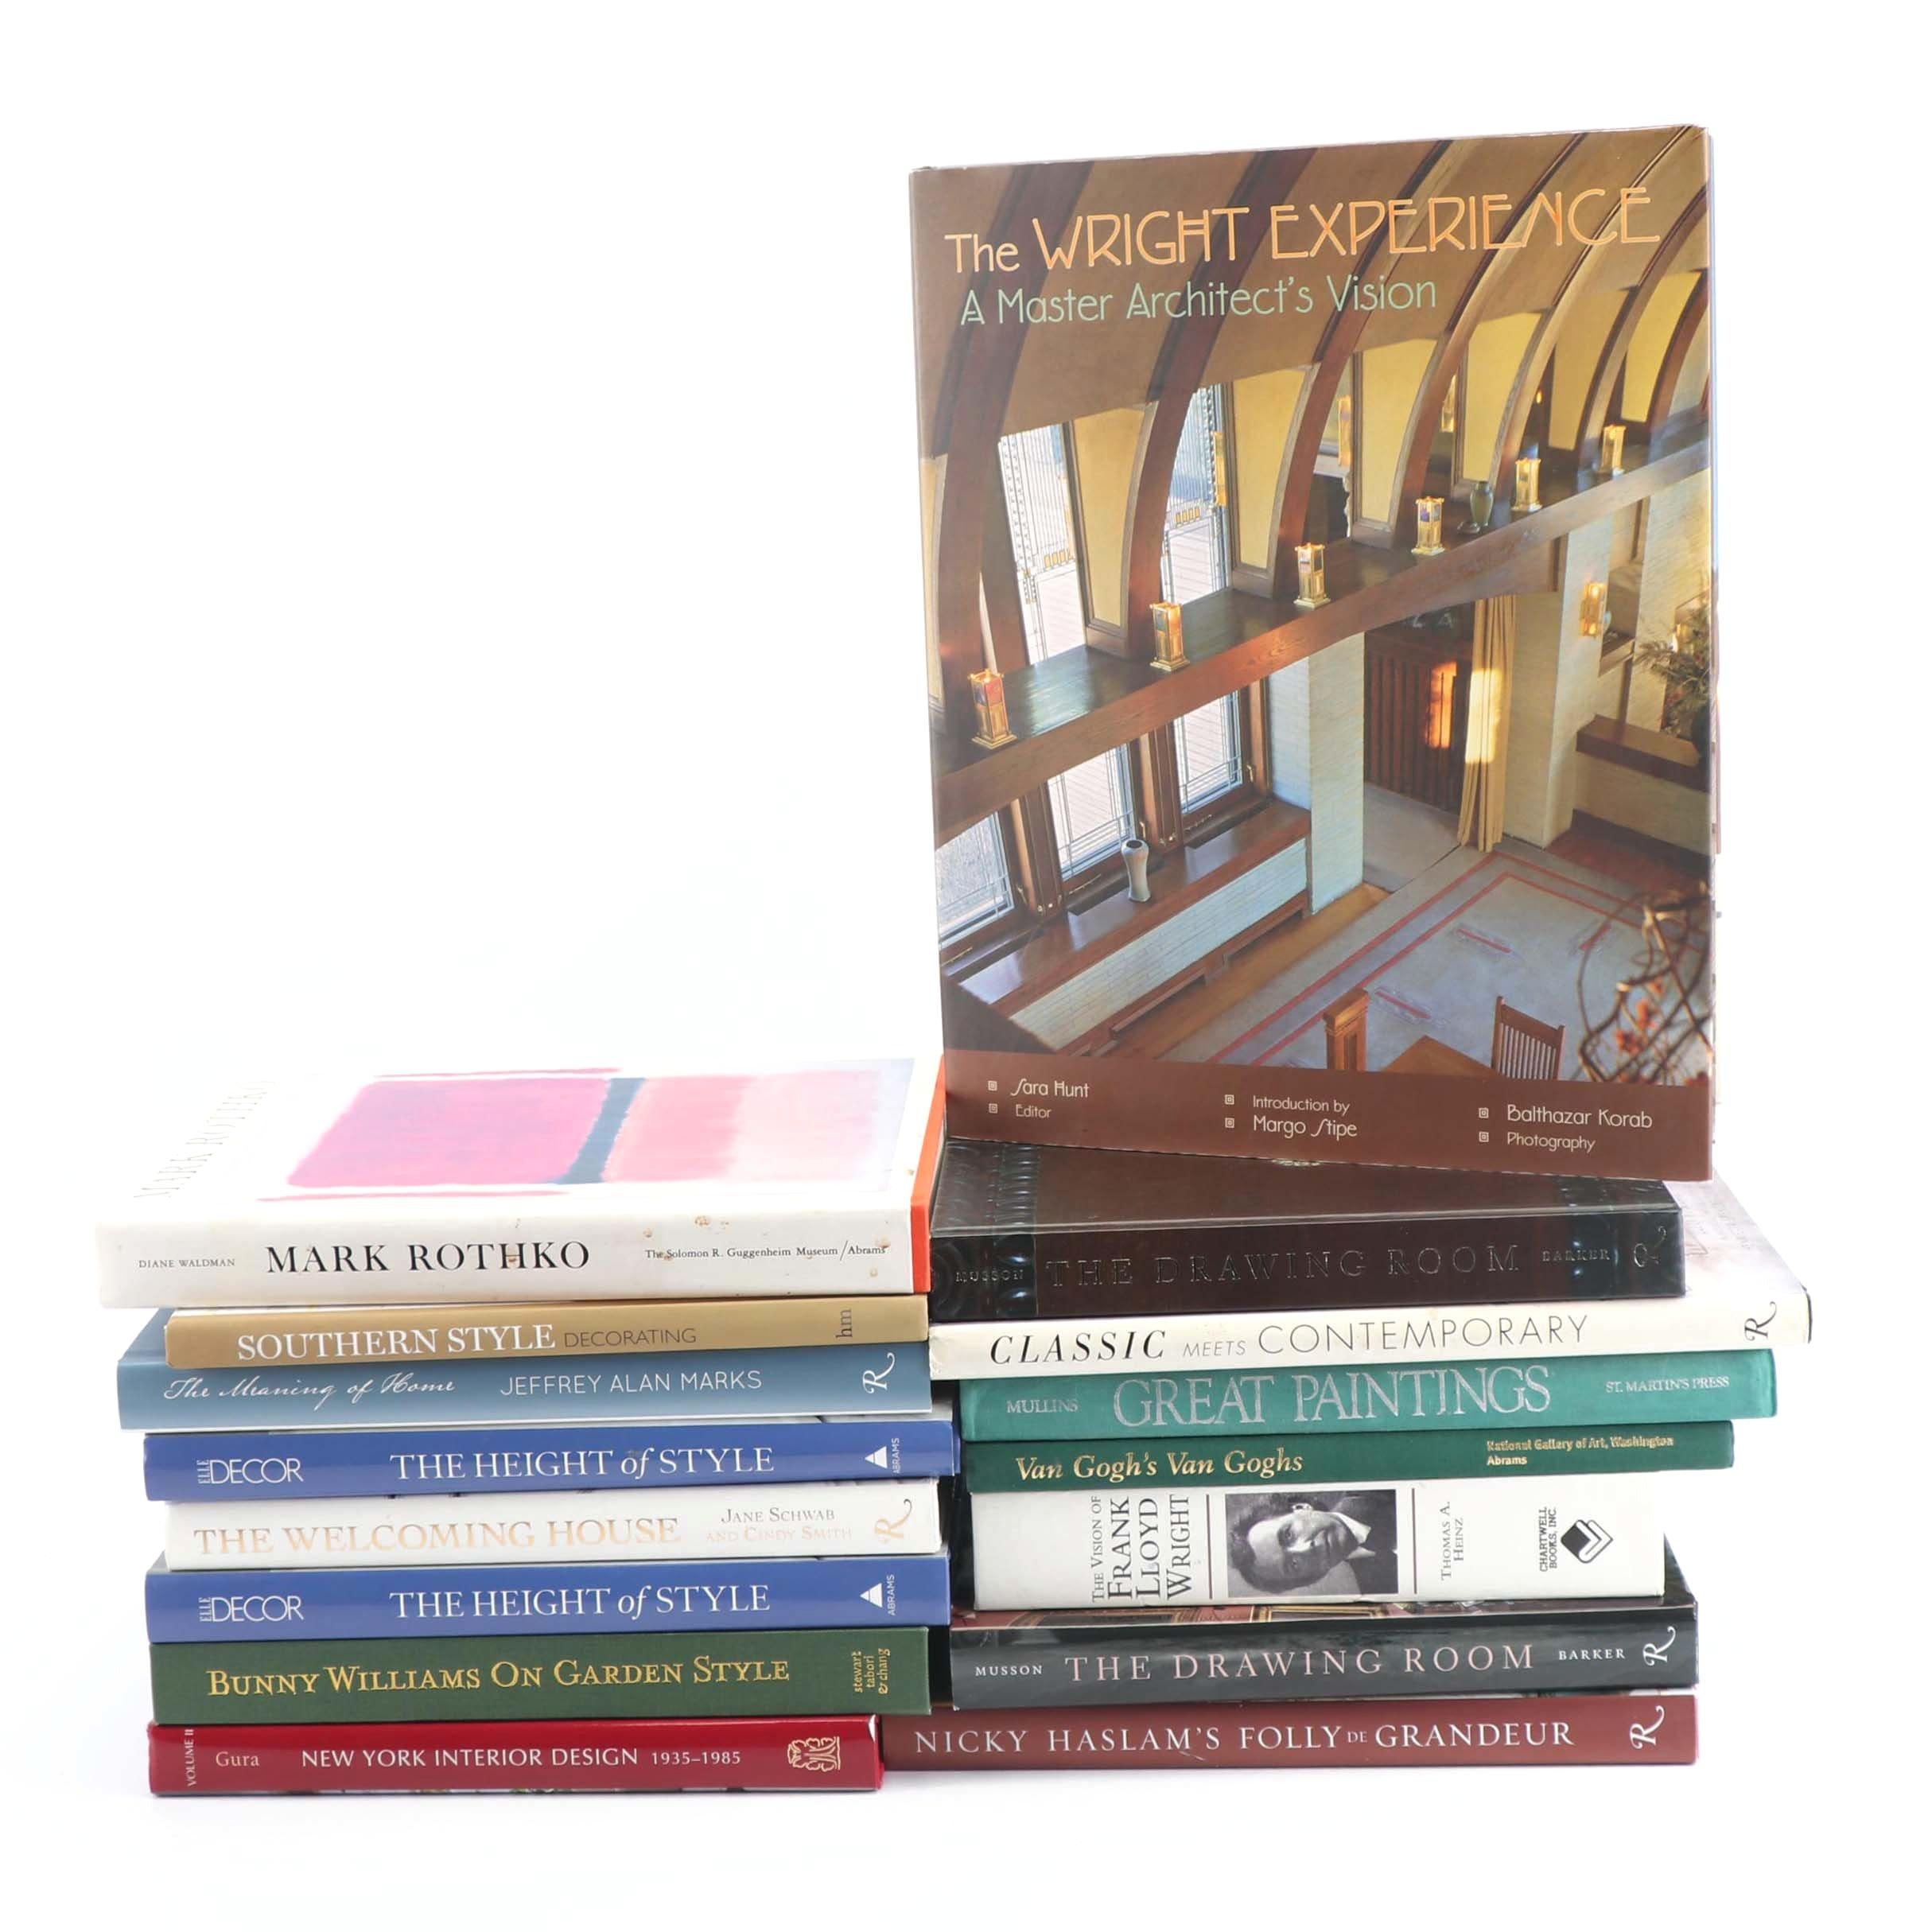 Home Decor, Art and Design Books including Frank Loyd Wright